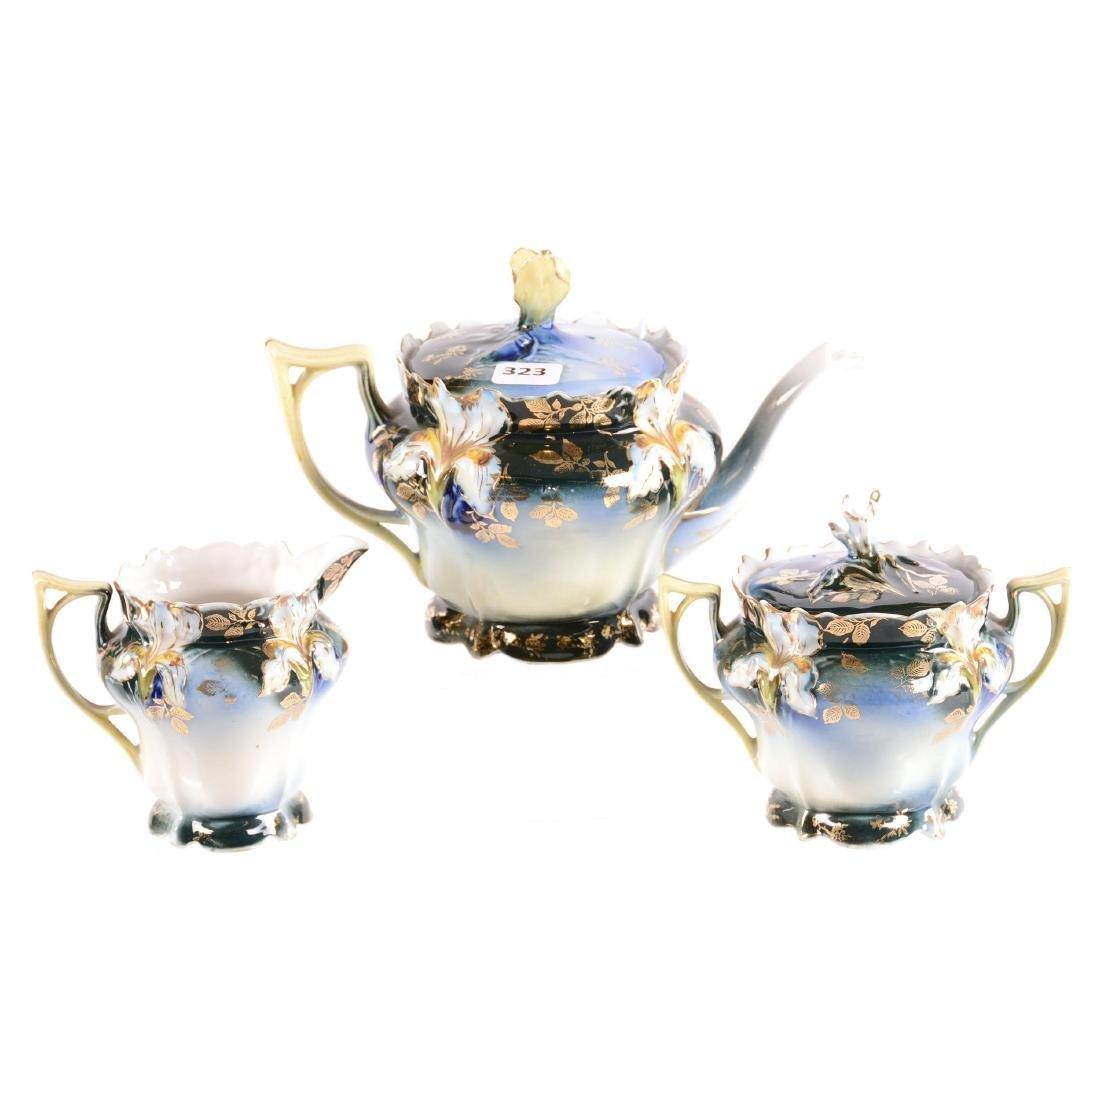 Tea Set - Unmarked - 2